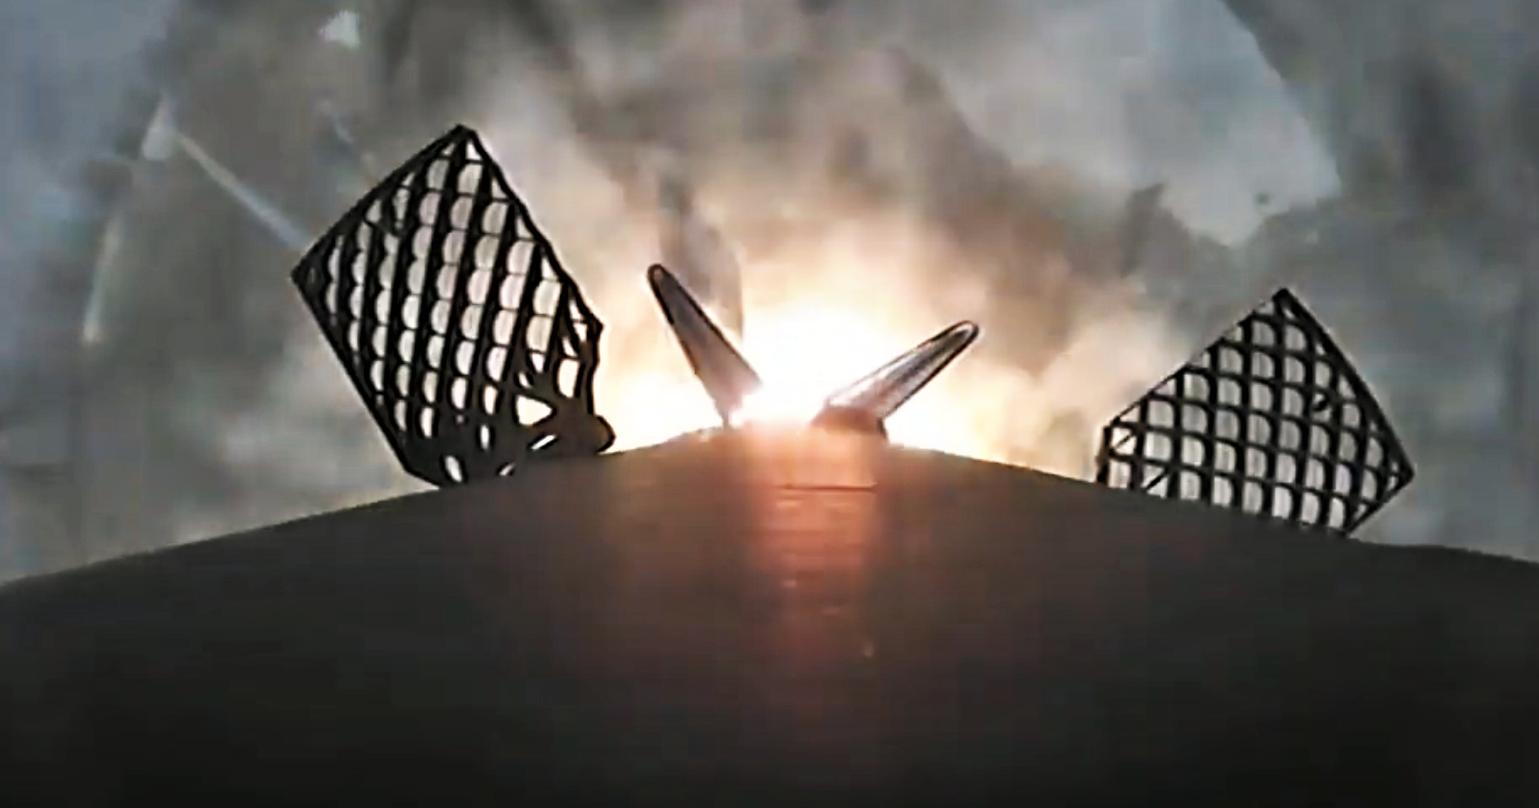 Cargo Dragon CRS-18 Falcon 9 B1056 (SpaceX) webcast 2 landing 3